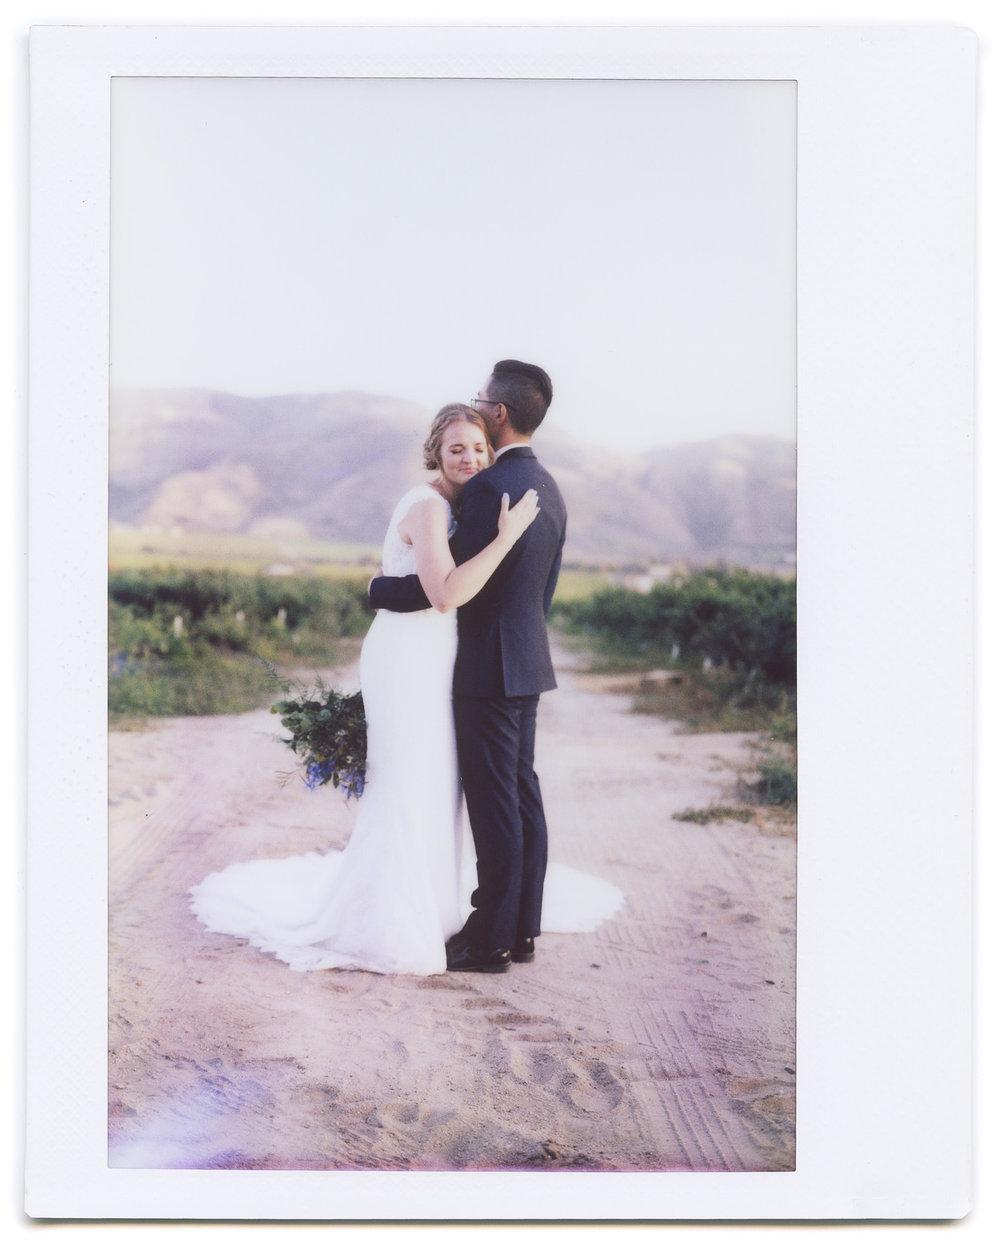 Wedding Instax portrait